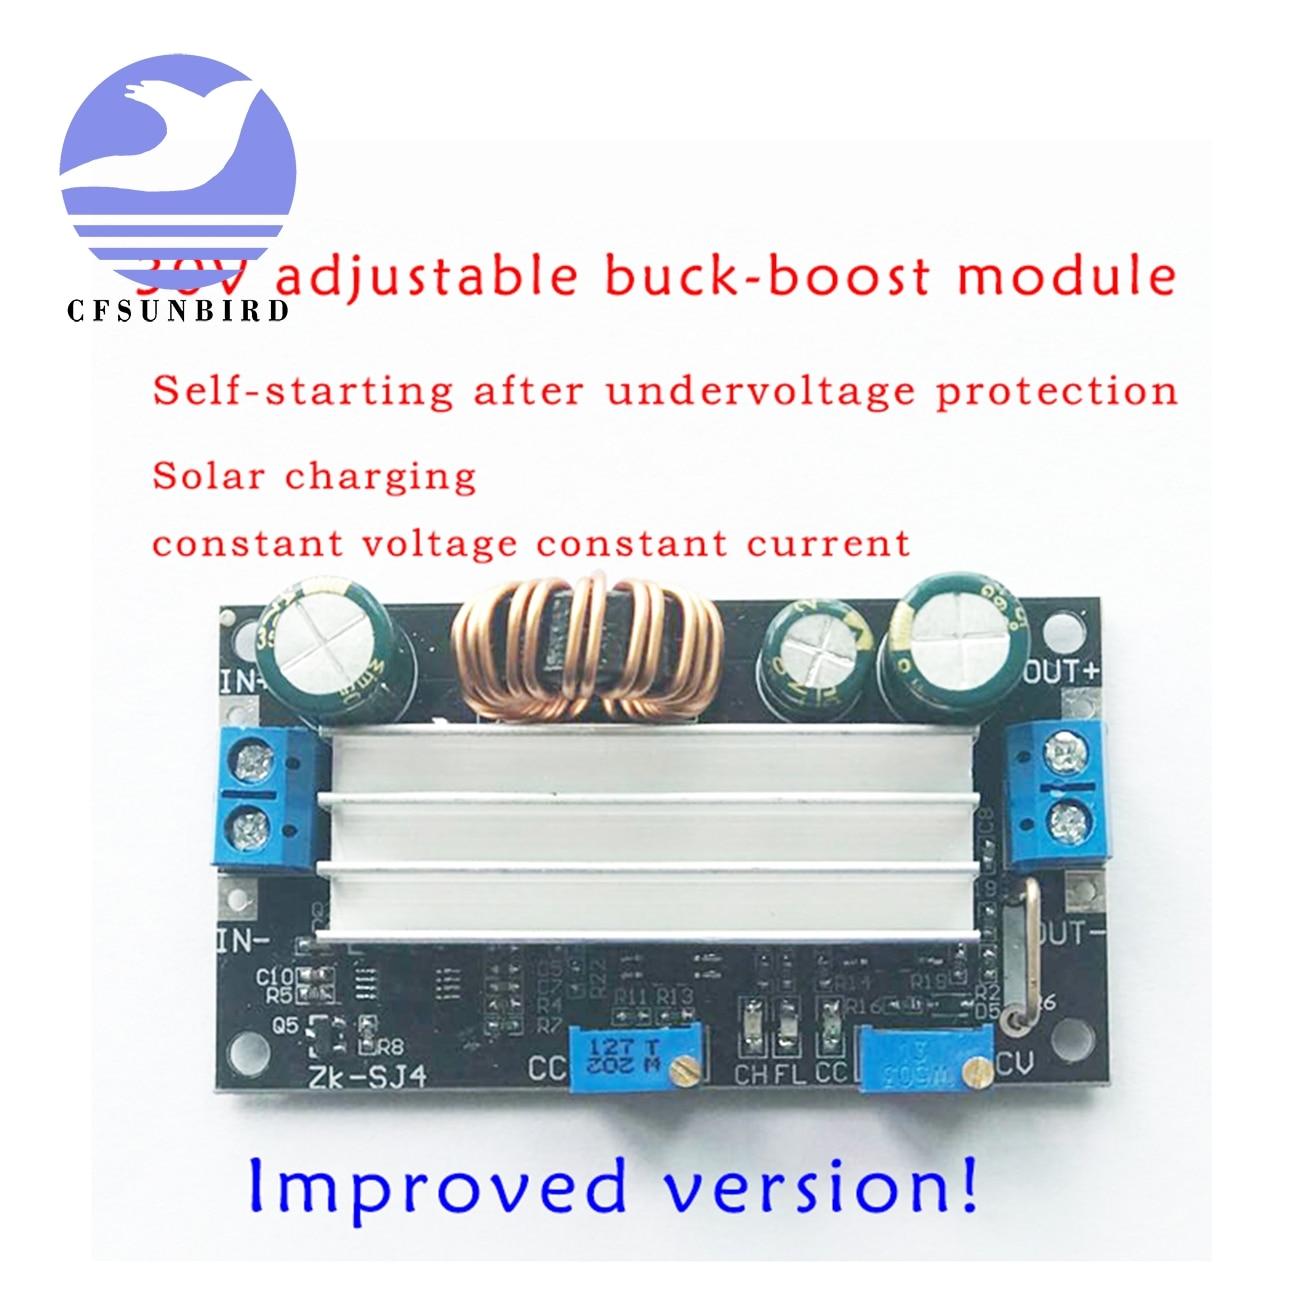 Controlador de carga del cargador Solar de 4,8-30 V del módulo de potencia CC DC automático Boost/Buck convertidor CC CV